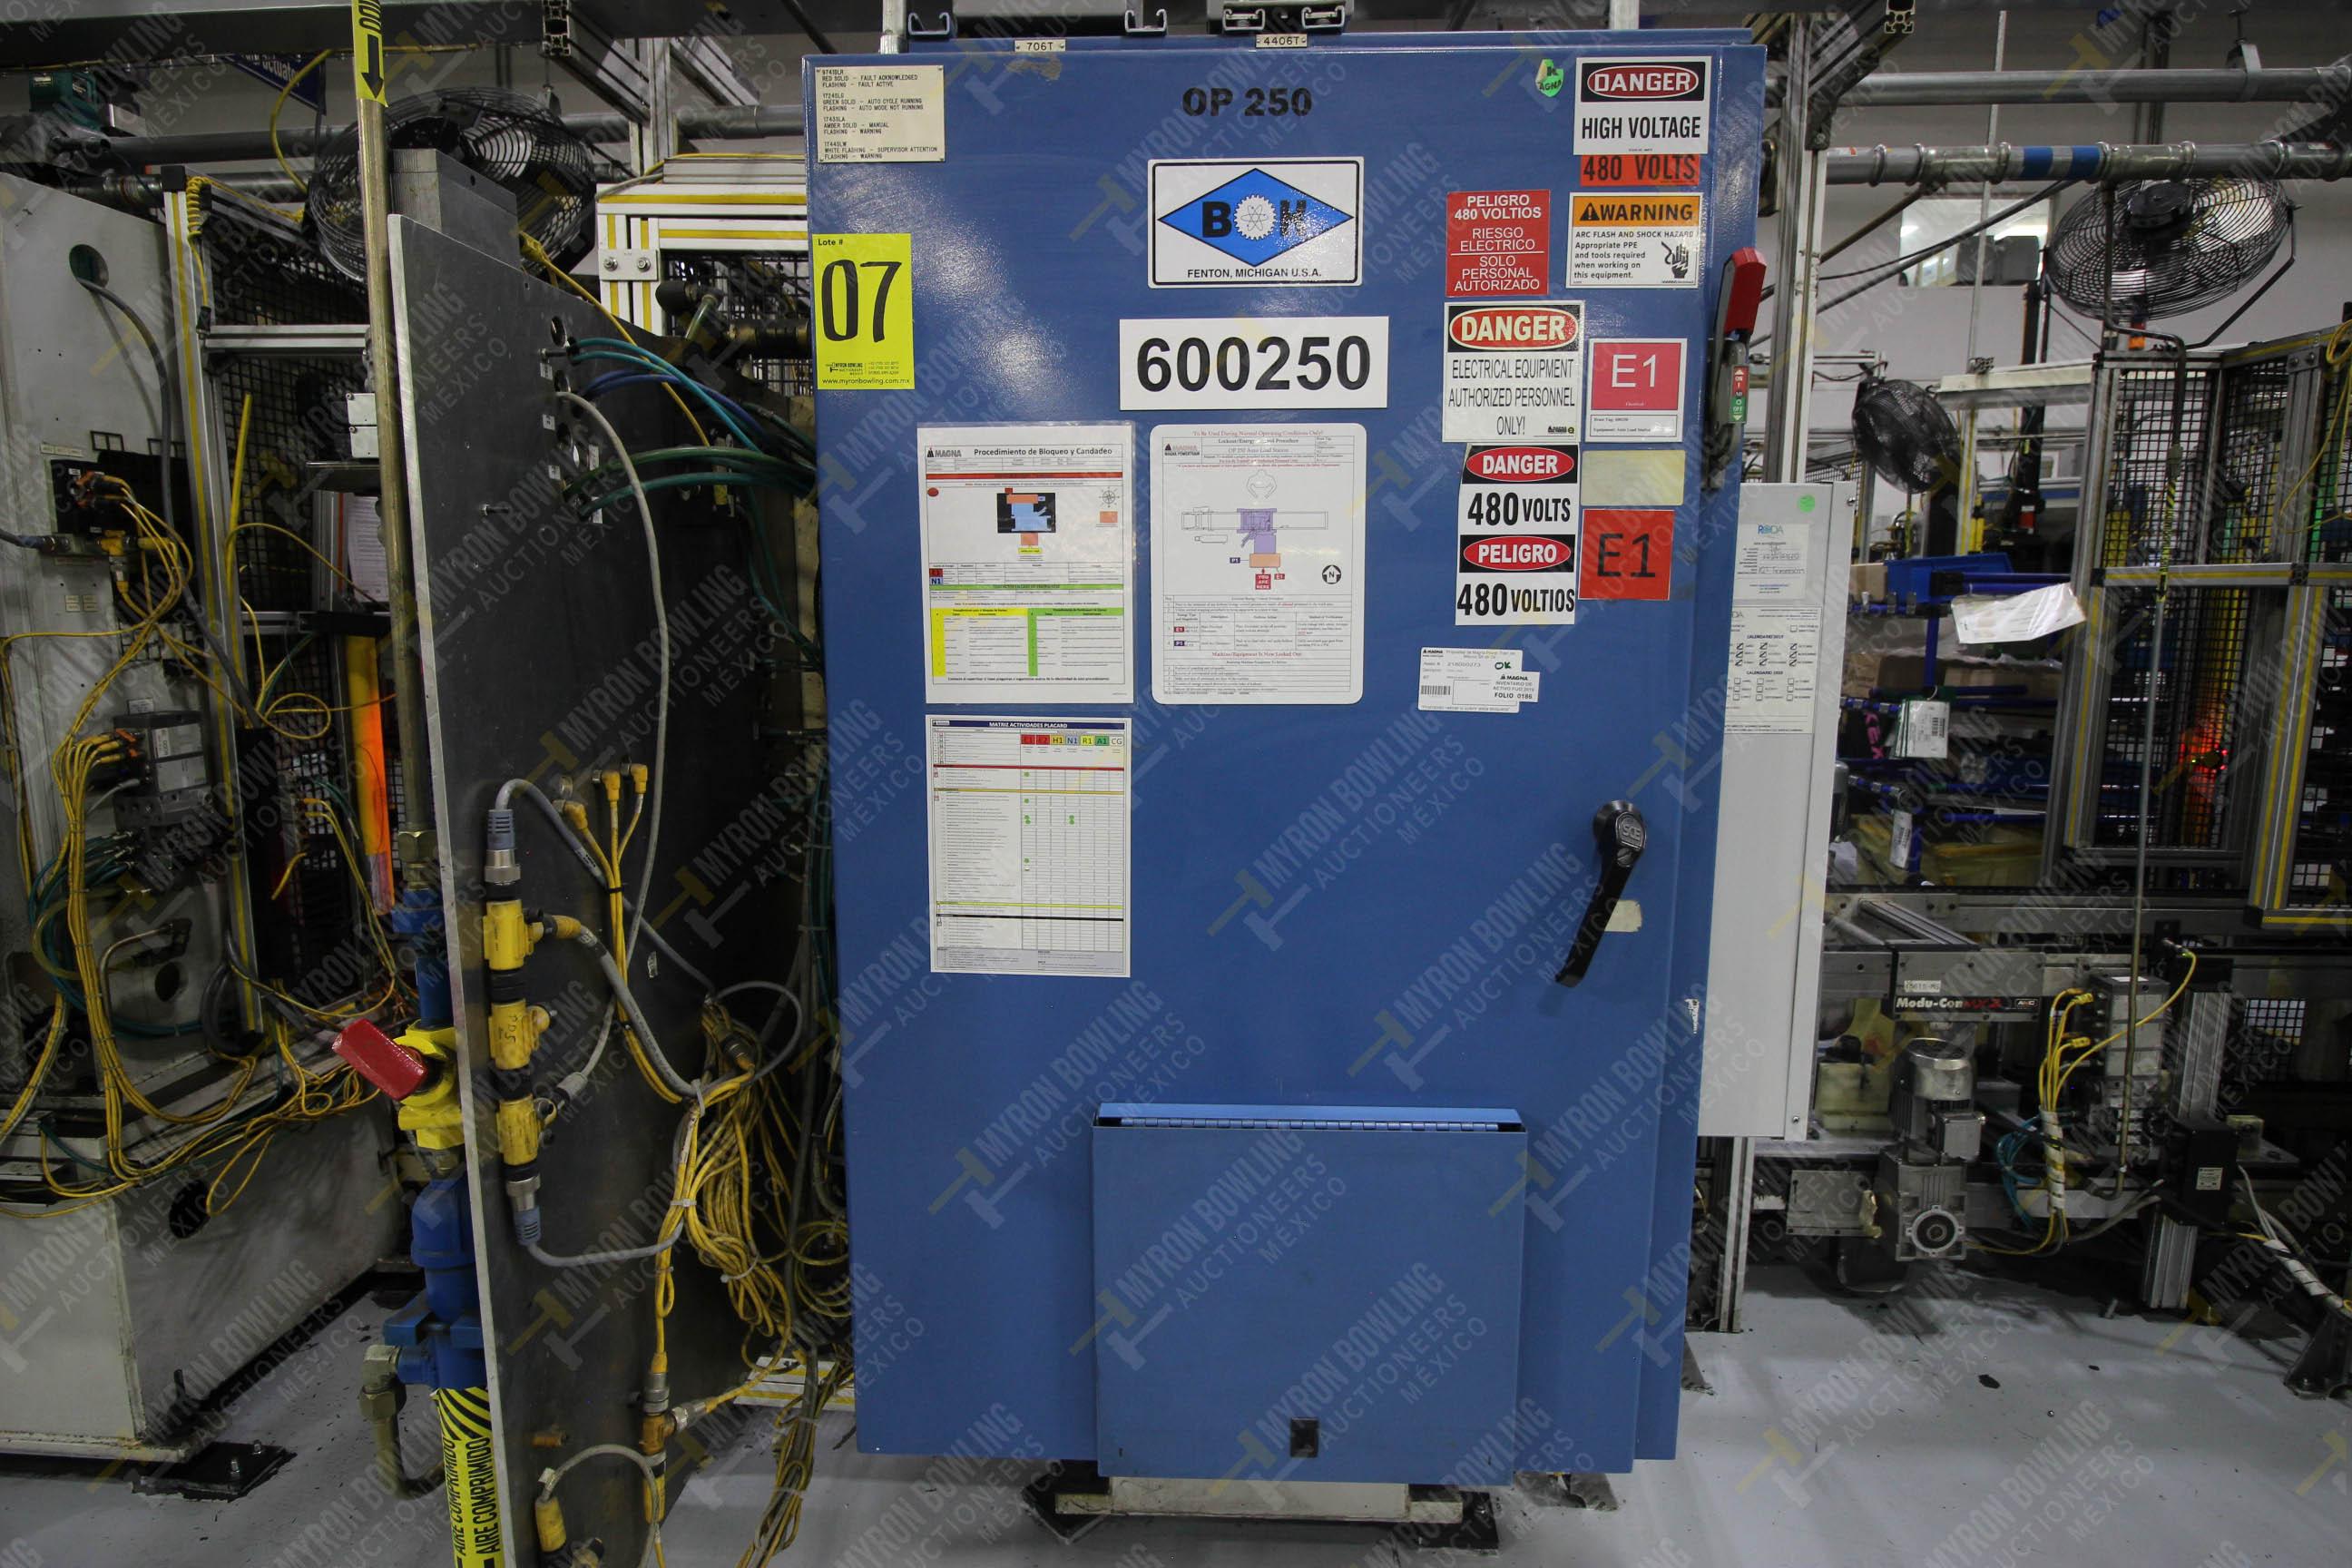 Estación semiautomática para operación 250 de ensamble de candado, contiene - Image 16 of 21